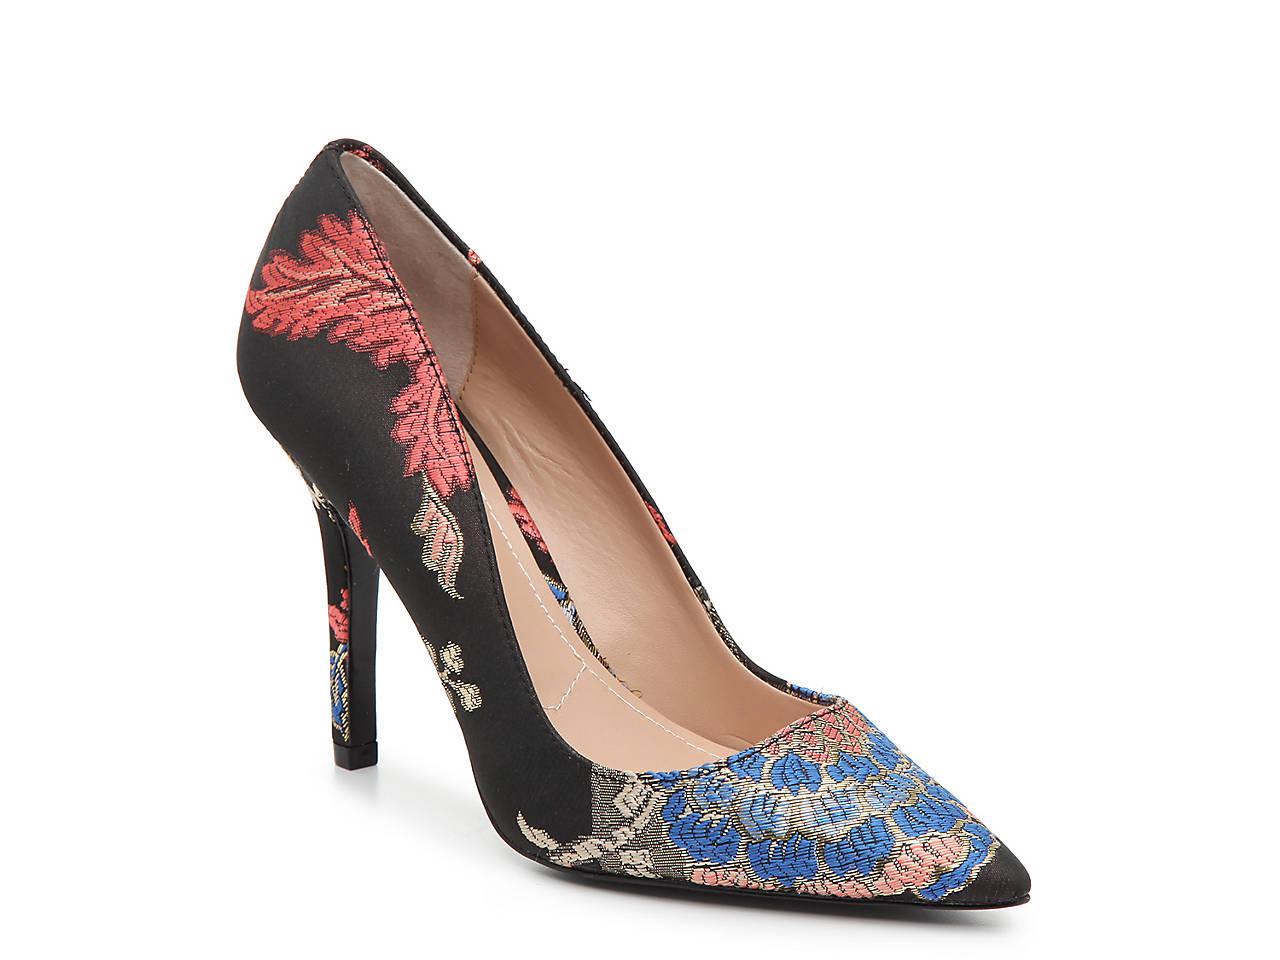 241ea51e8932 Charles by Charles David Sweetness Pump Women s Shoes